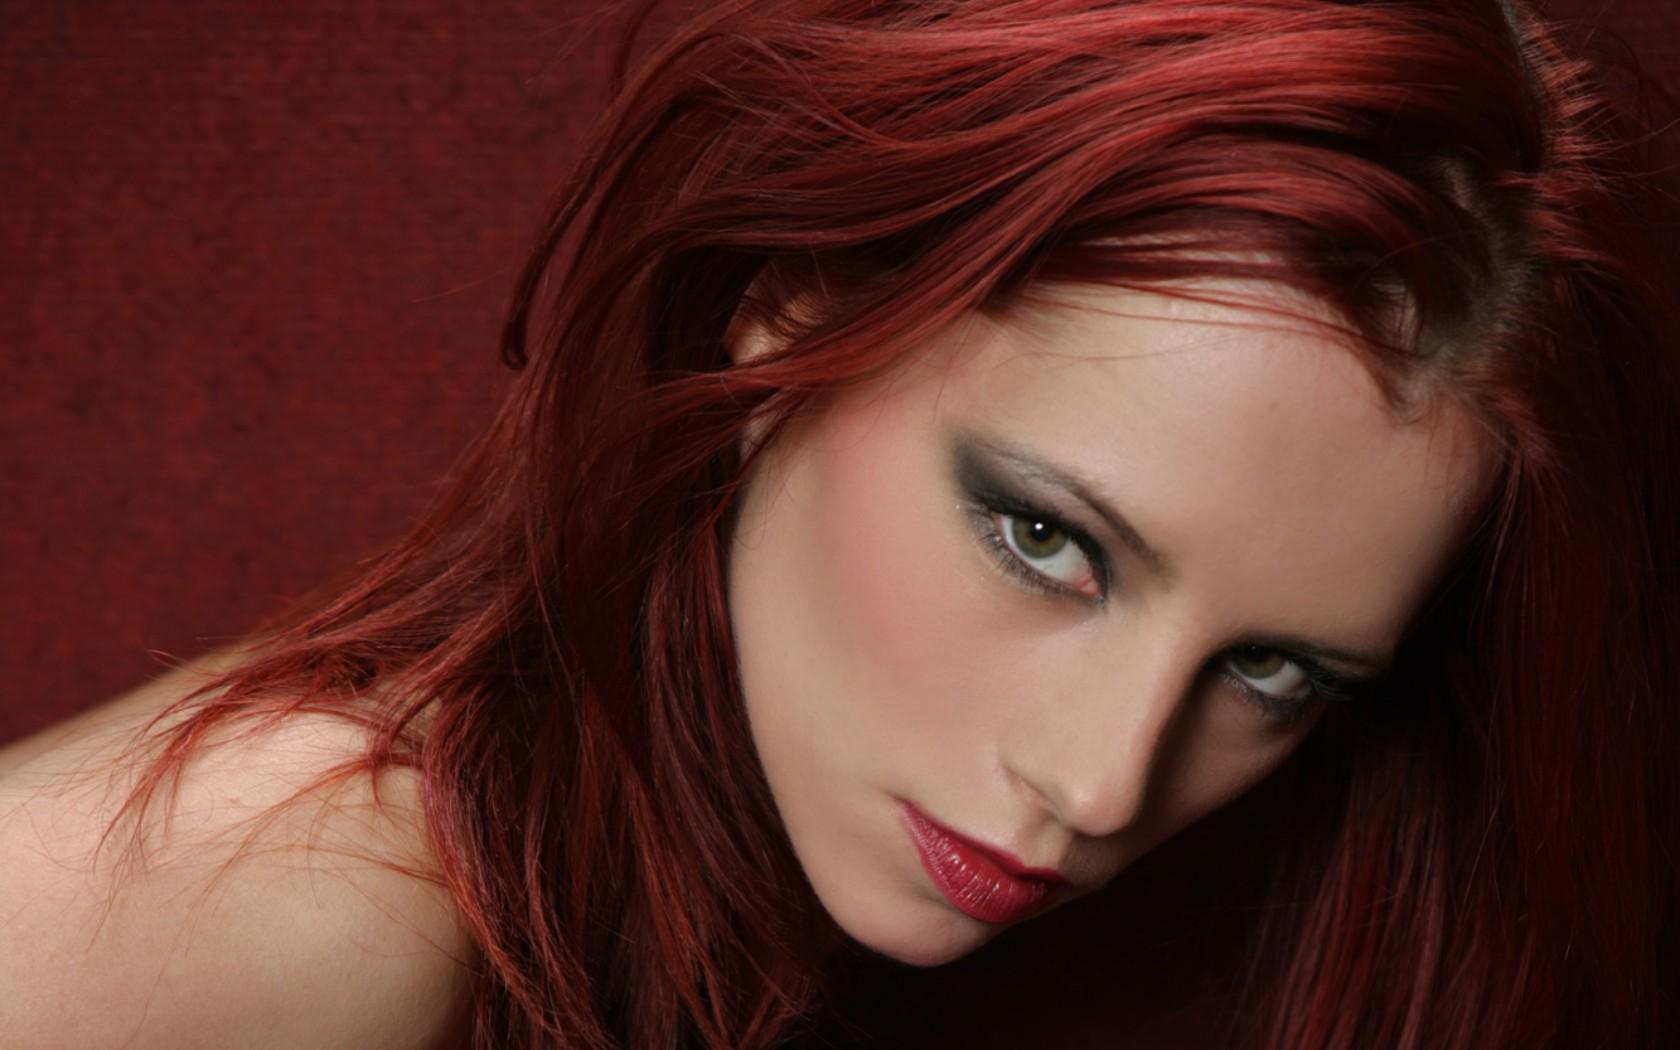 piper Fawn Ariel Adult Women Models Actress Females Girls 1680x1050